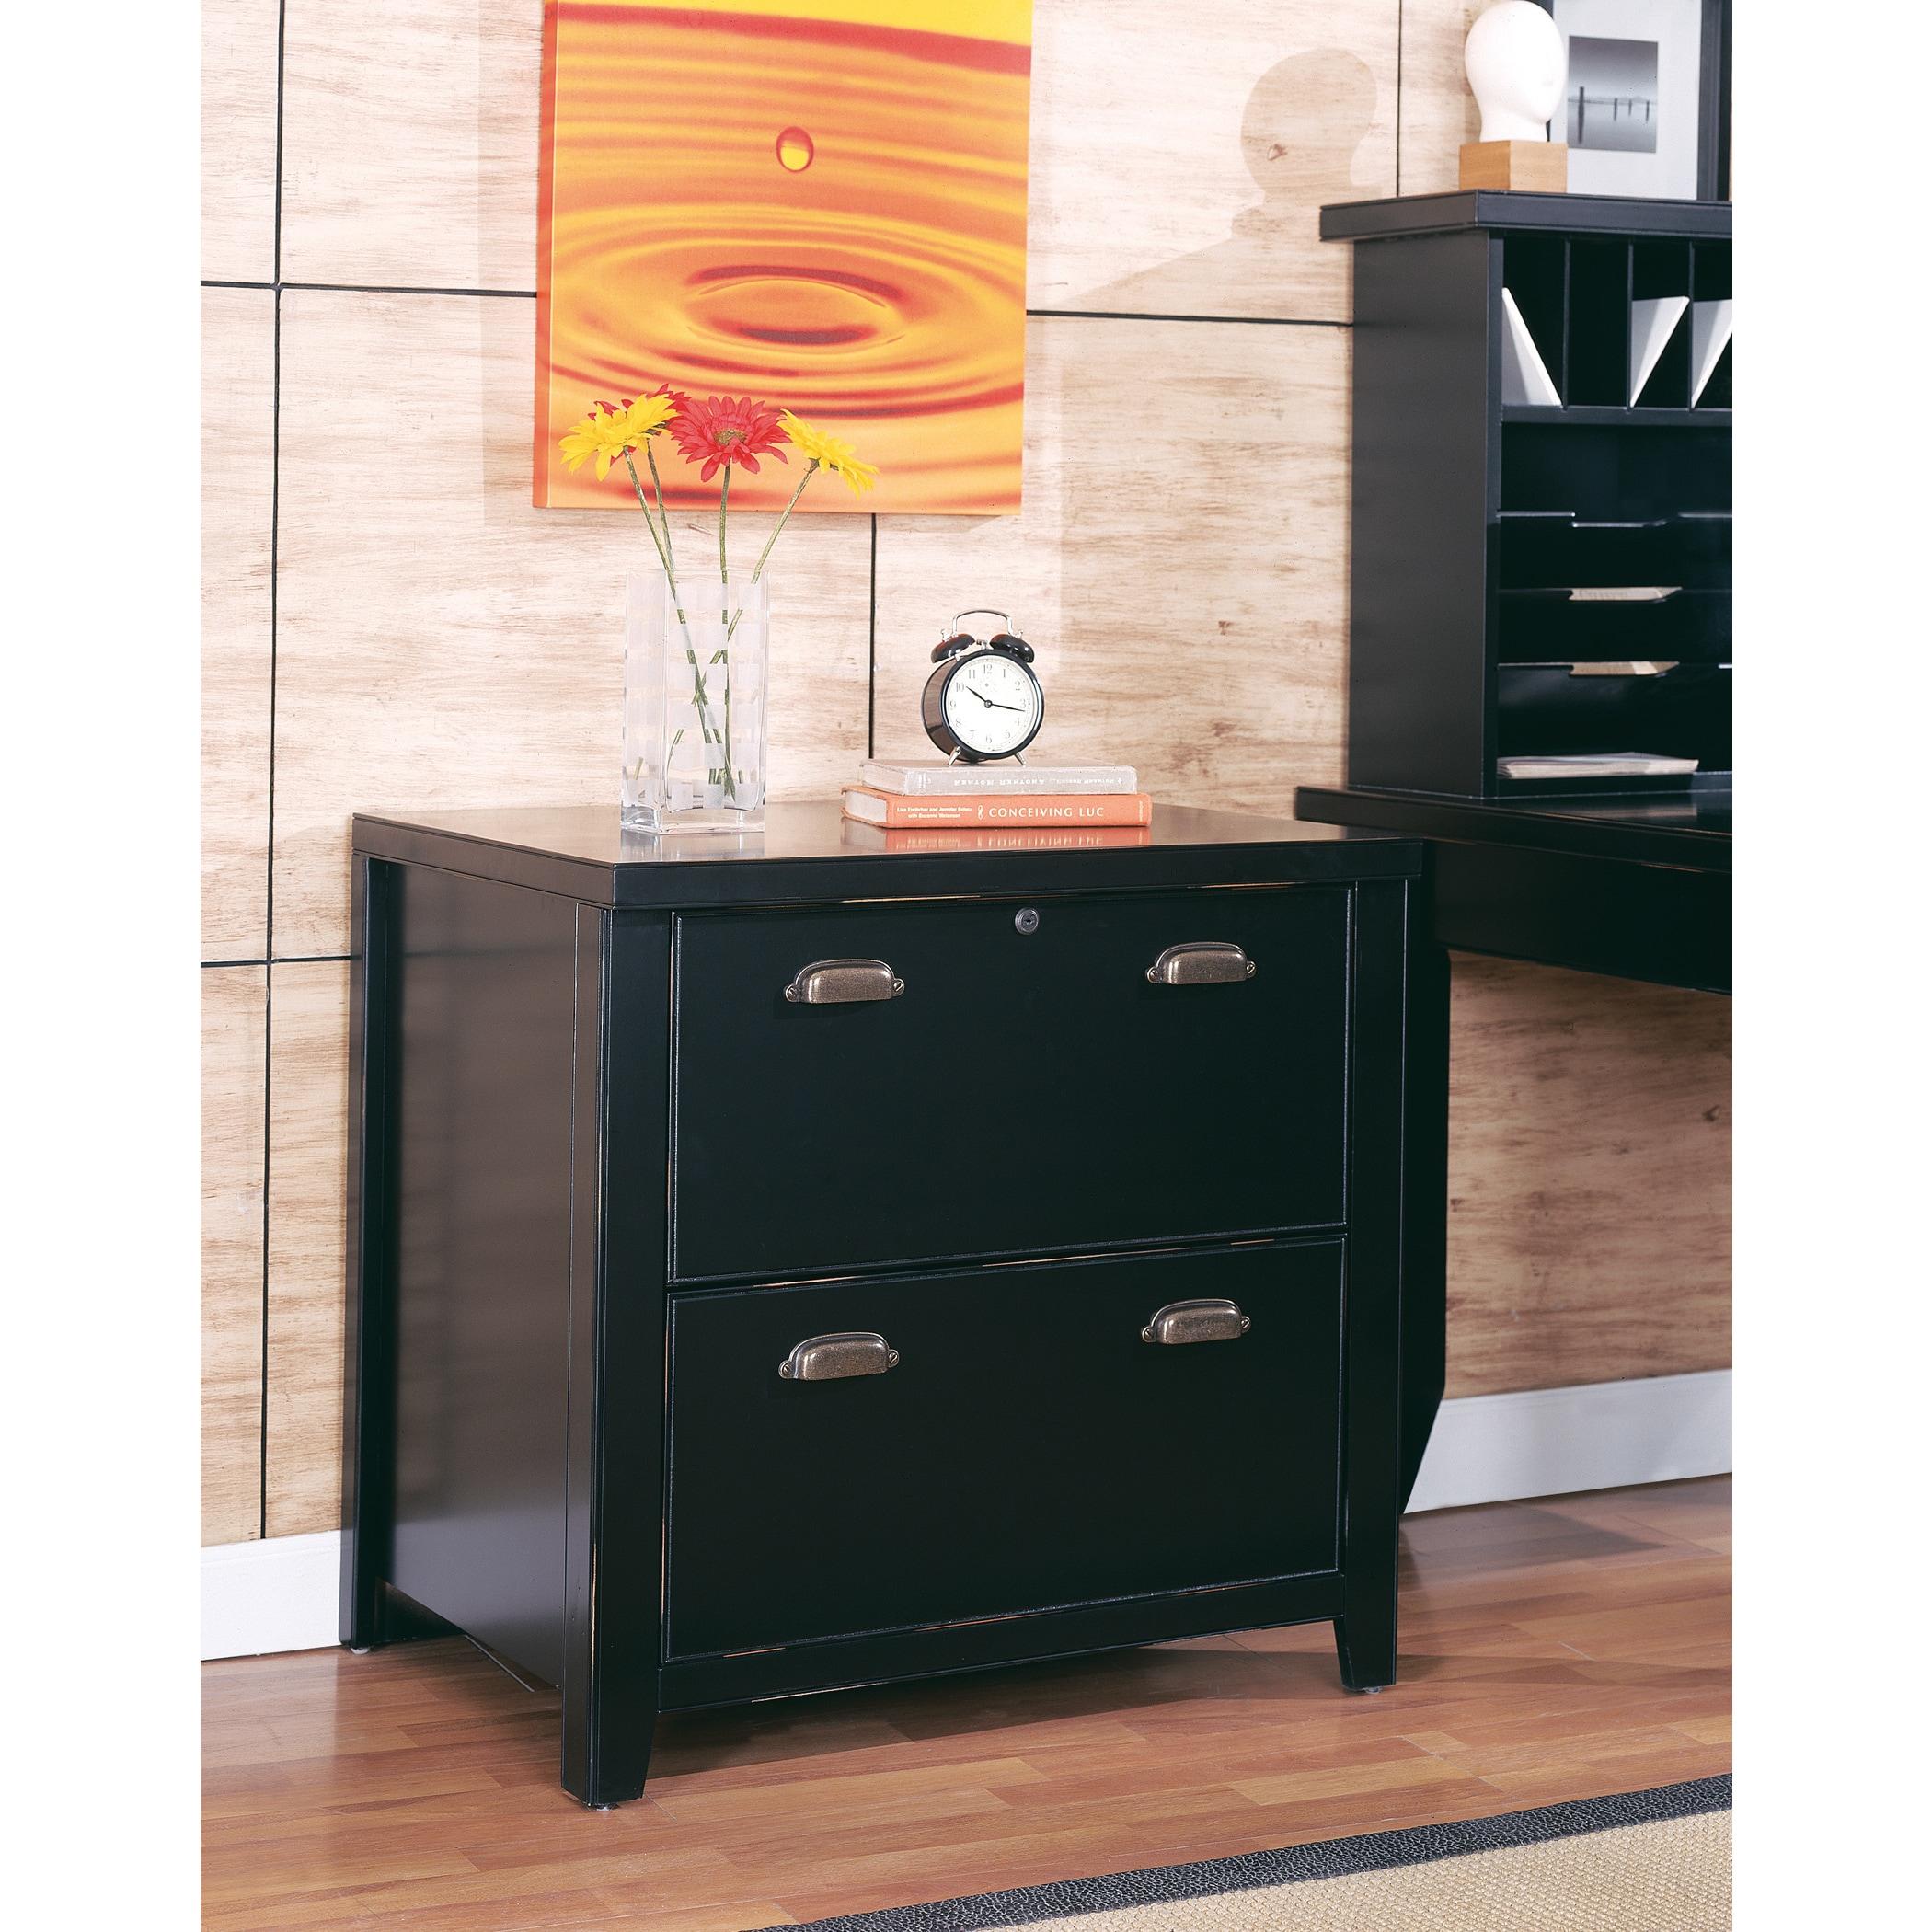 Tansley Landing Black 2 Drawer Lateral File Cabinet